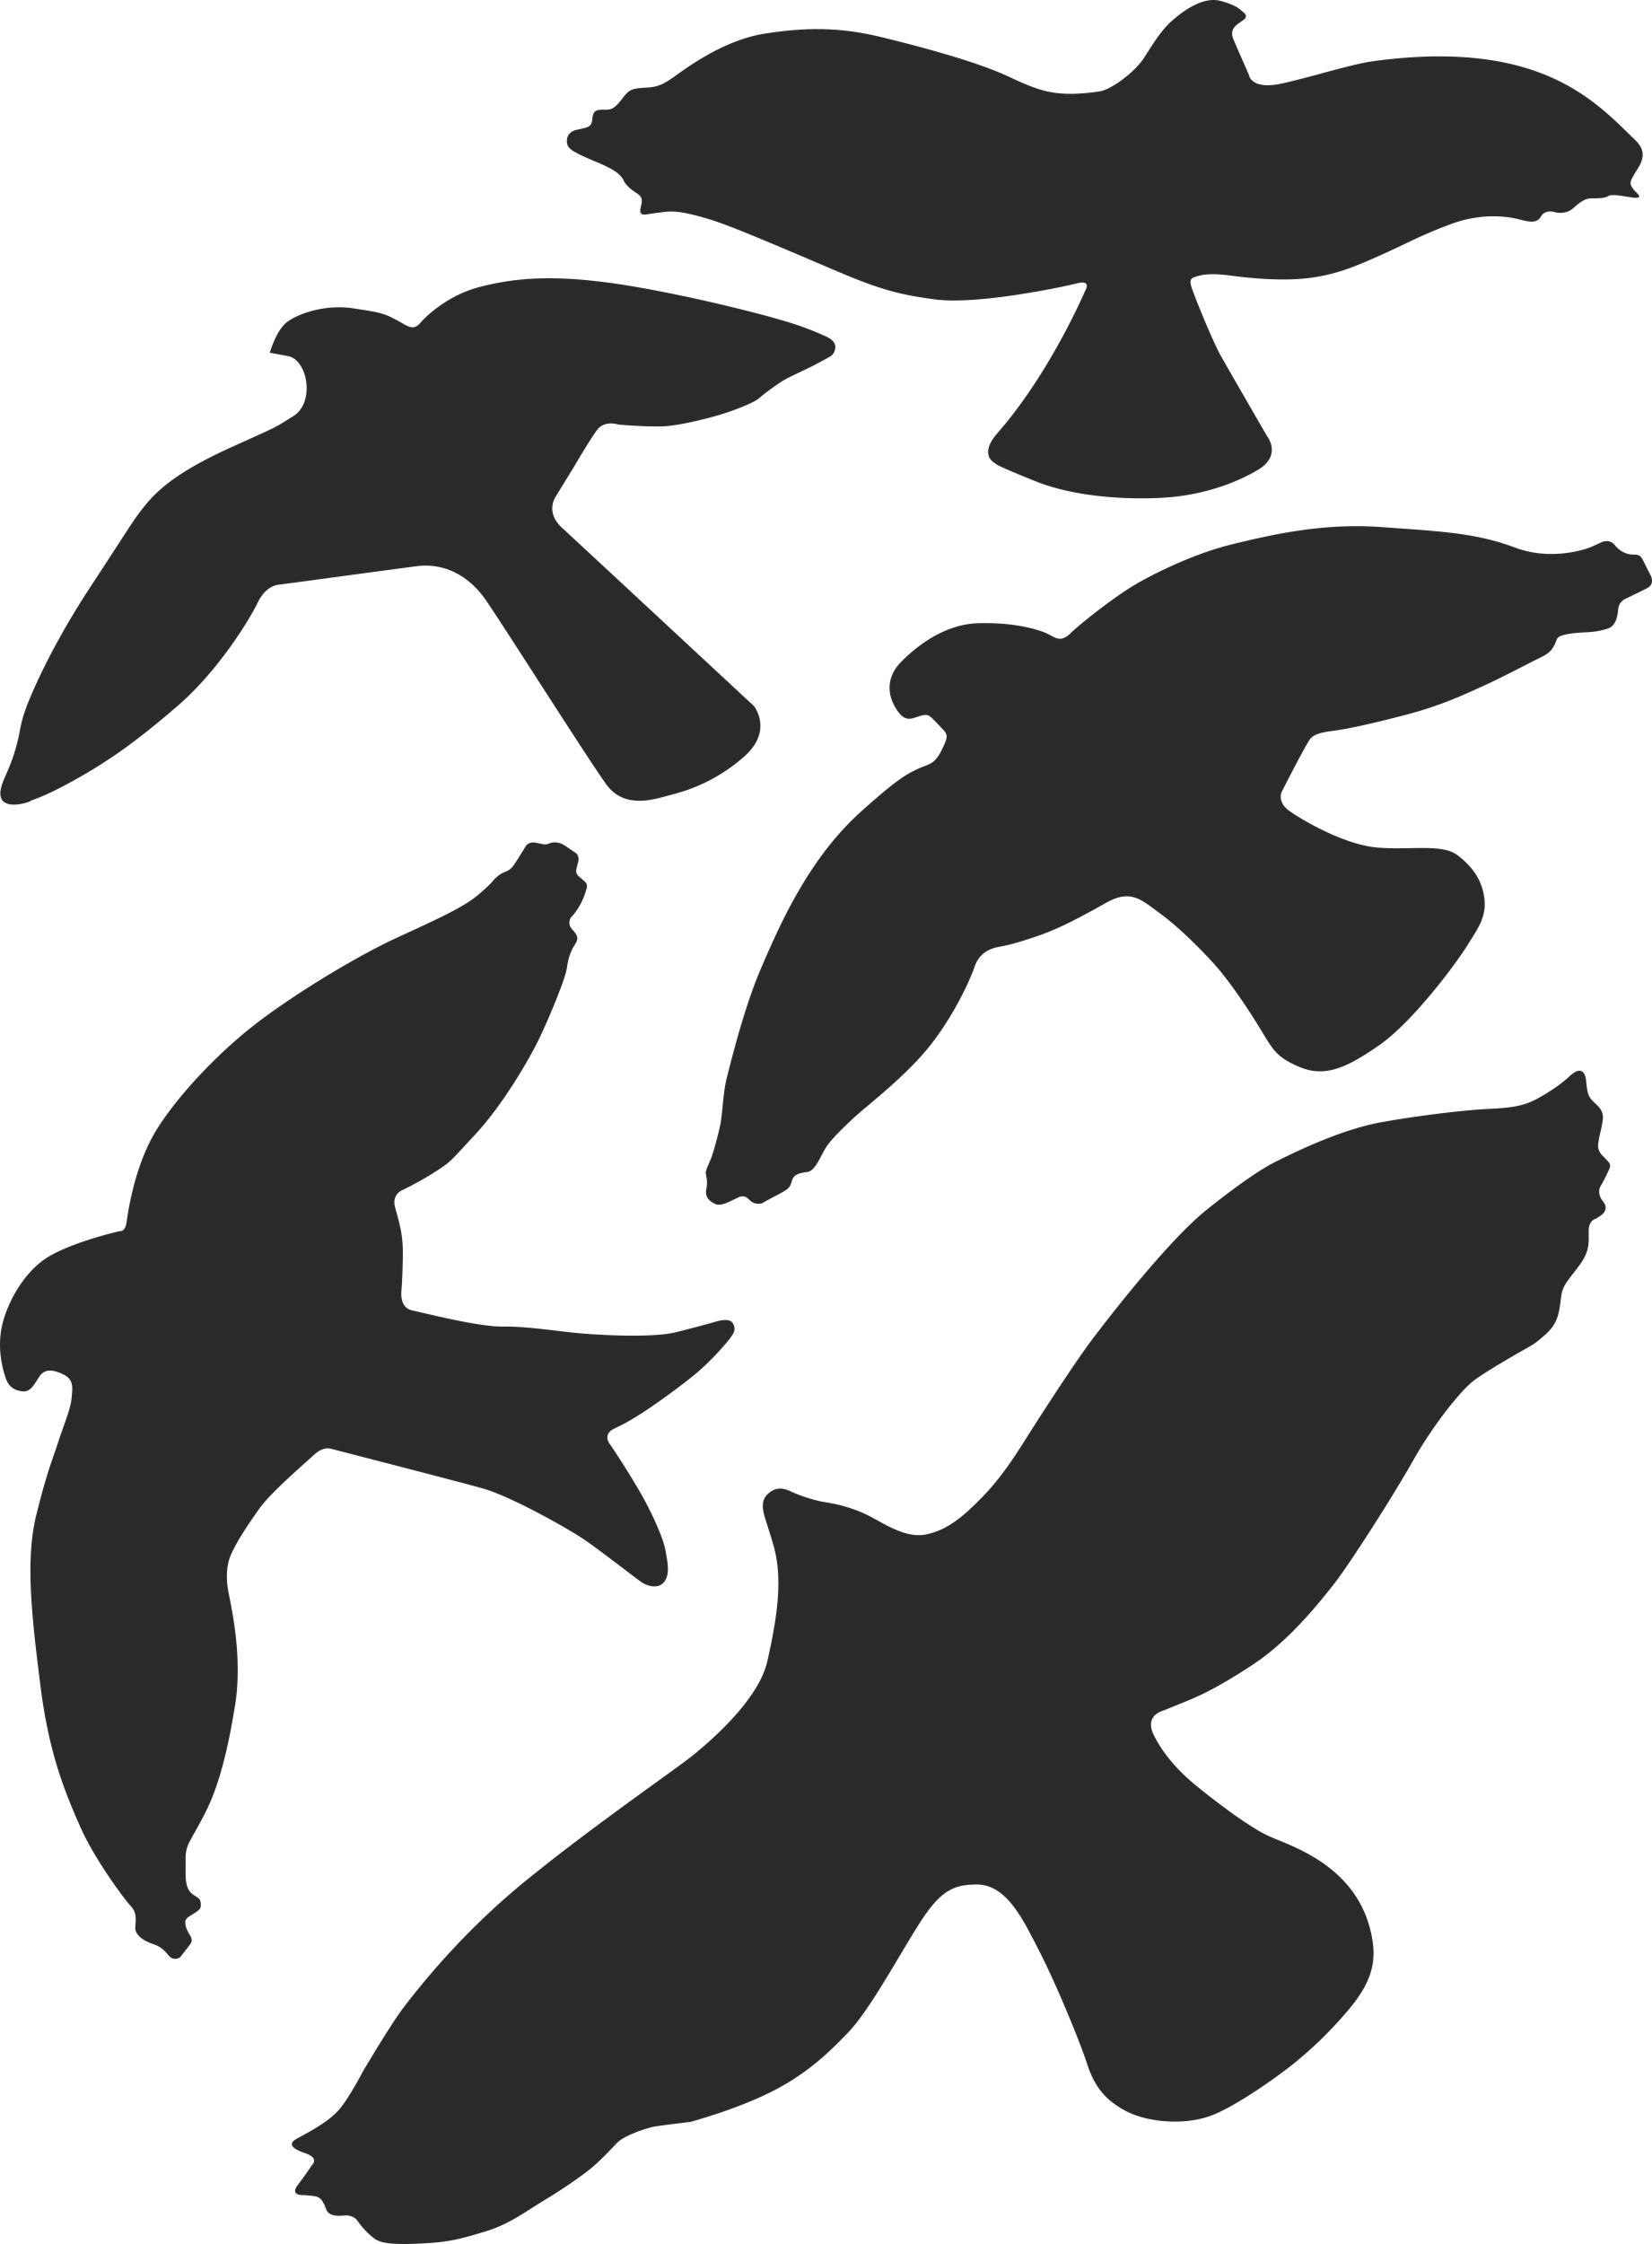 Aufkleber Kontur Vogel-Sortiment 5 Stück – Bild 1